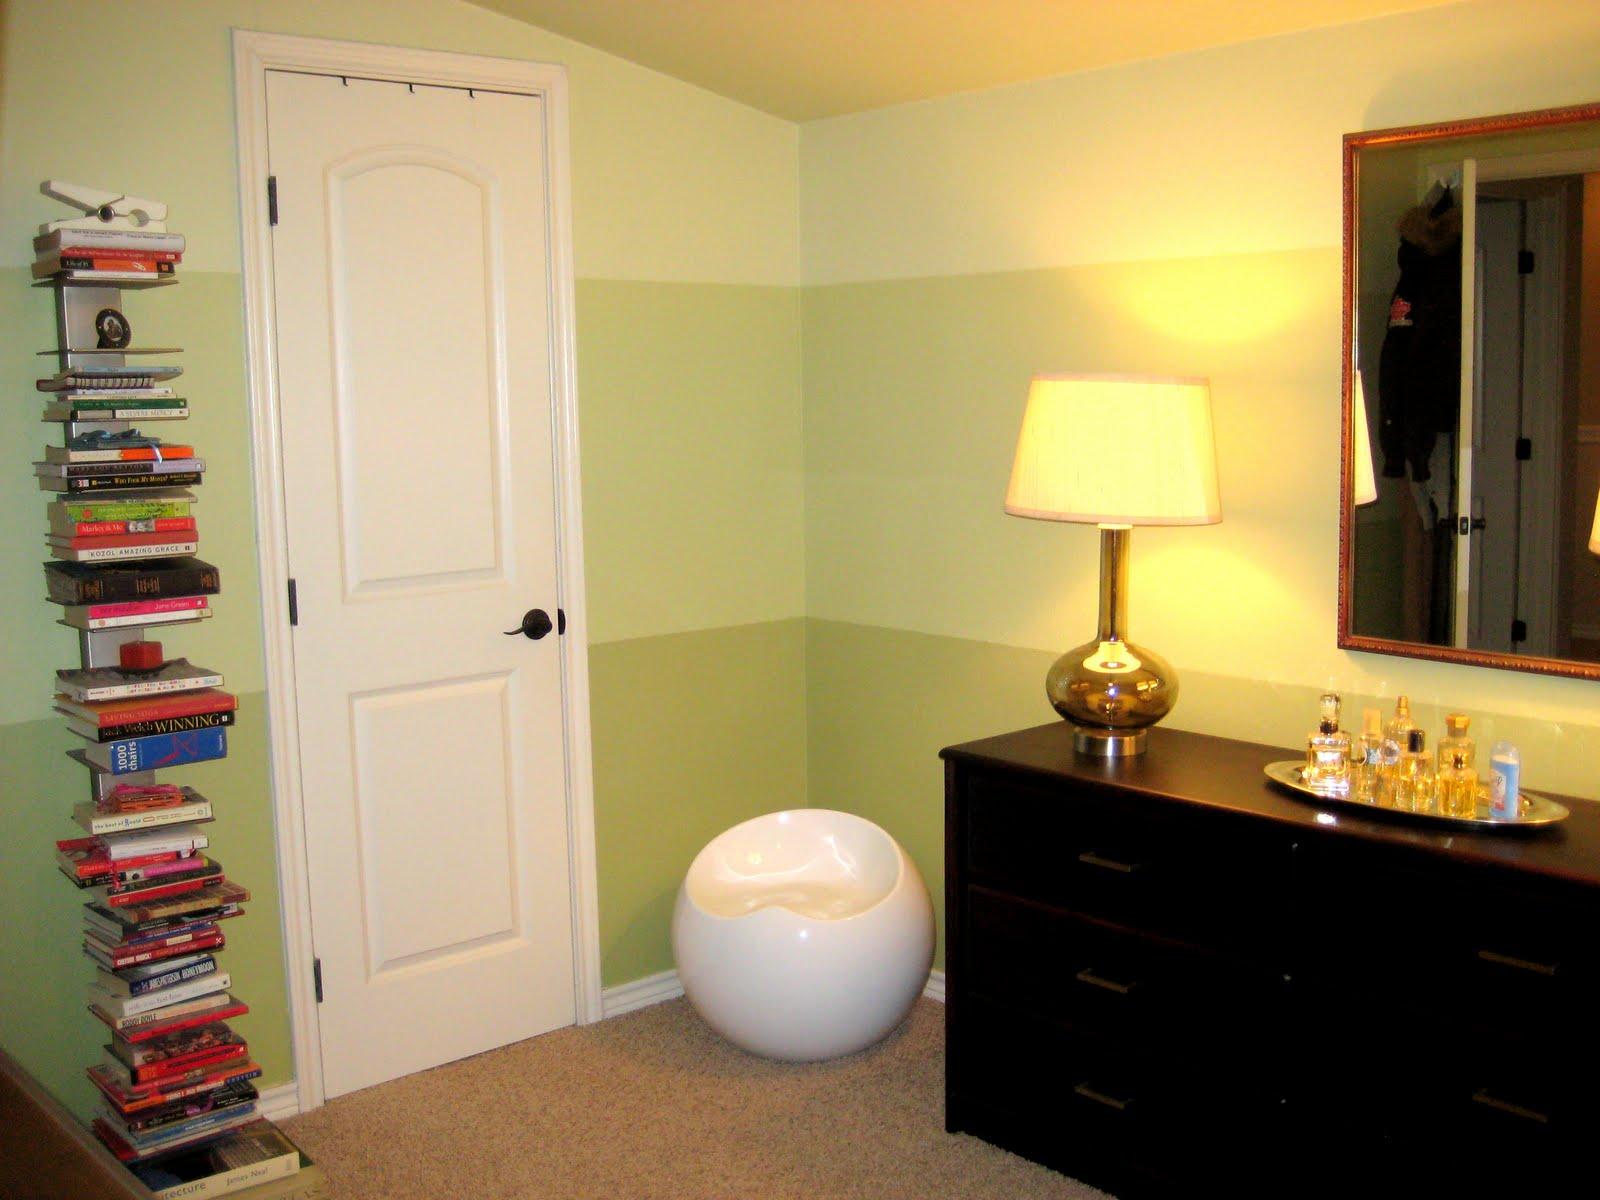 C.R.A.F.T. # 37: Thrifty Modern Bedroom - C.R.A.F.T.